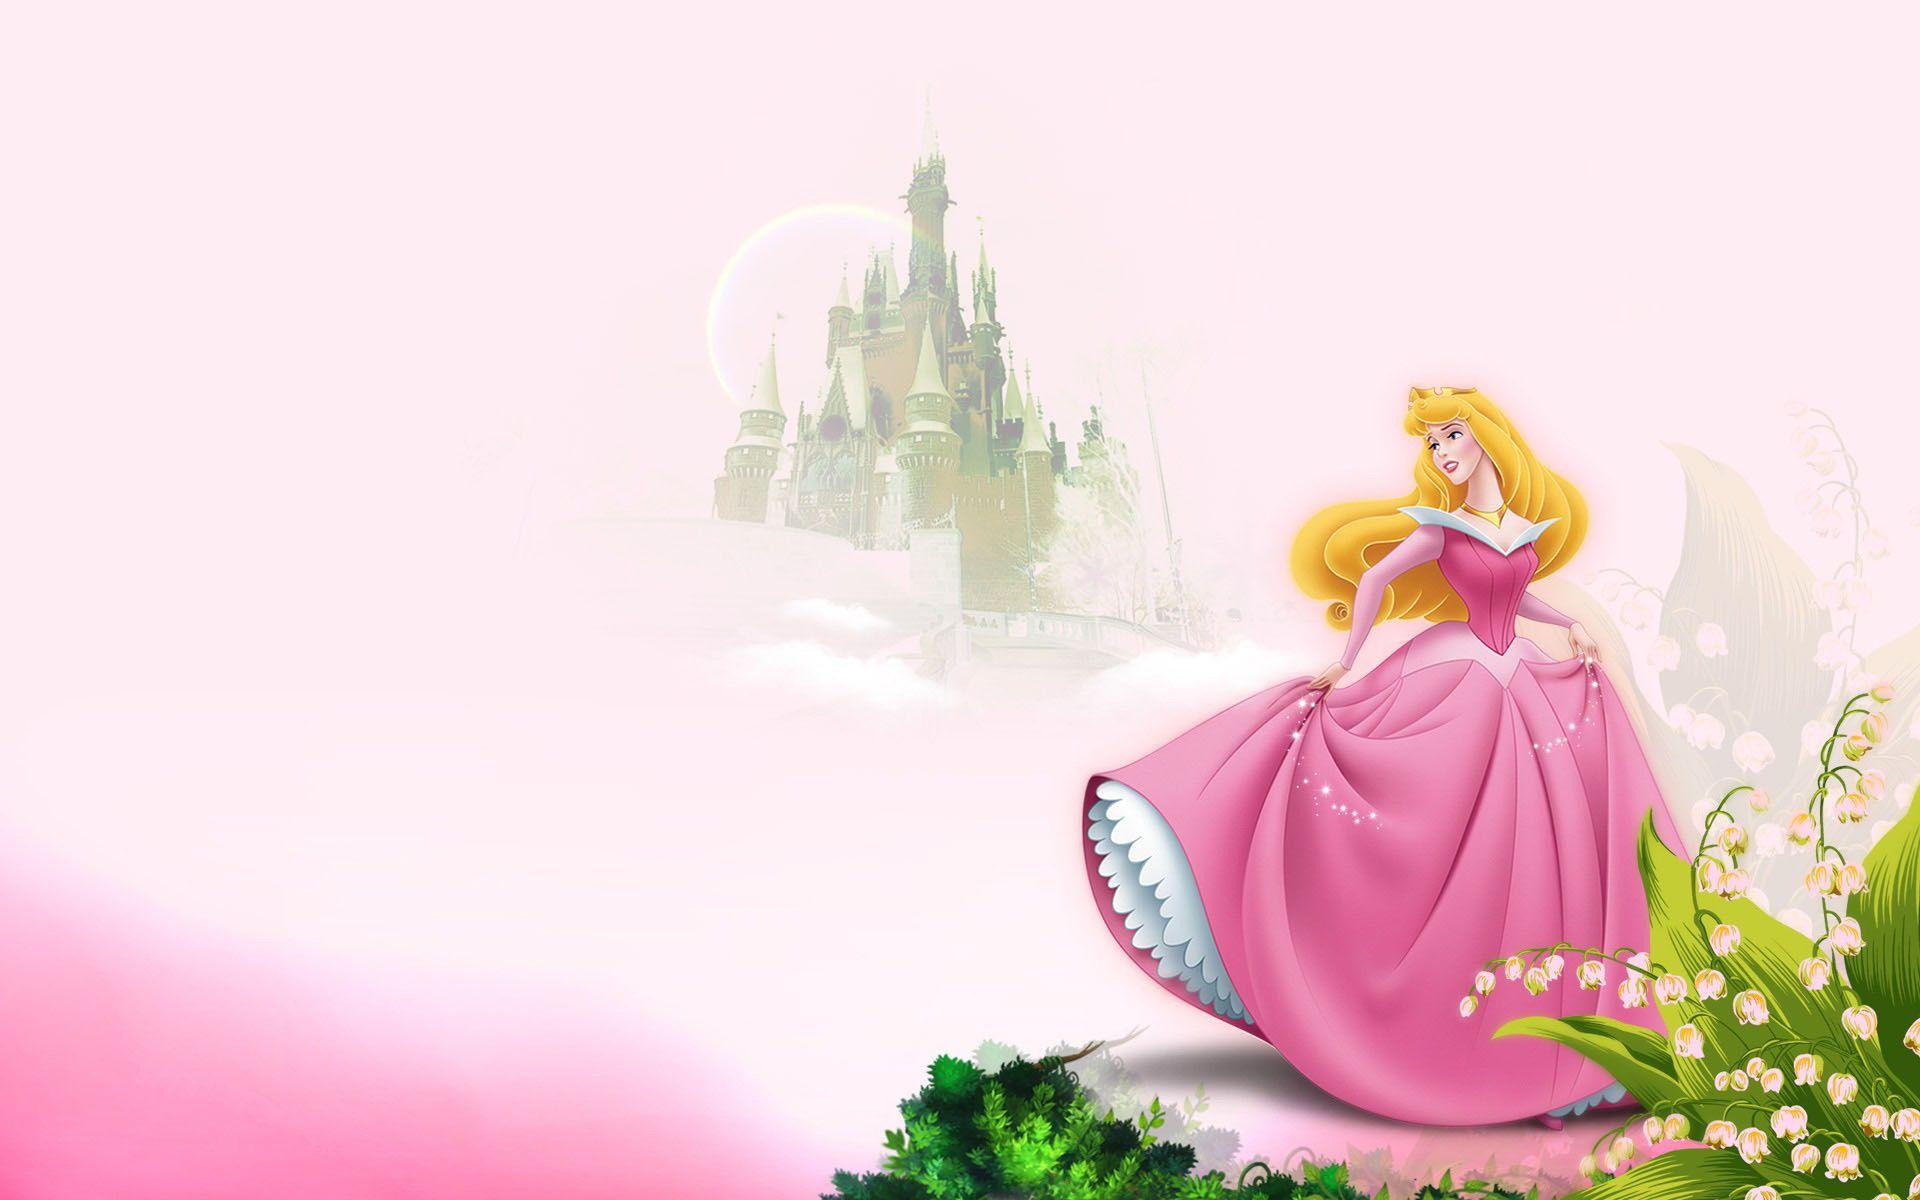 Disney Princesses Sleeping Beauty Wallpaper 1920x1200